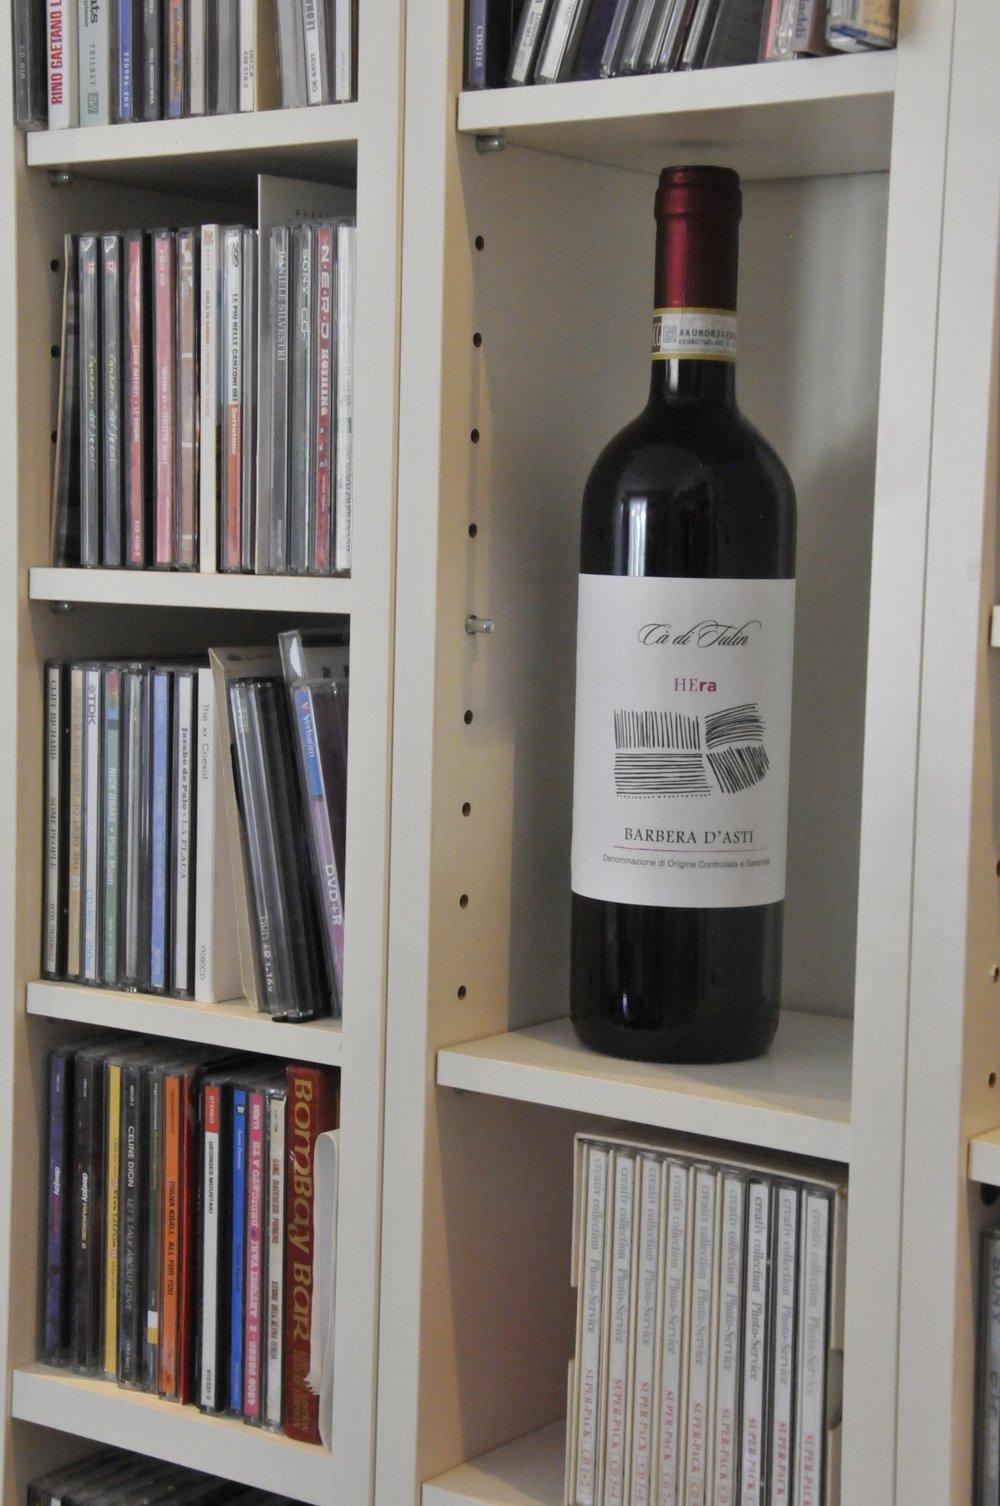 Caditulin wines picture32.jpg